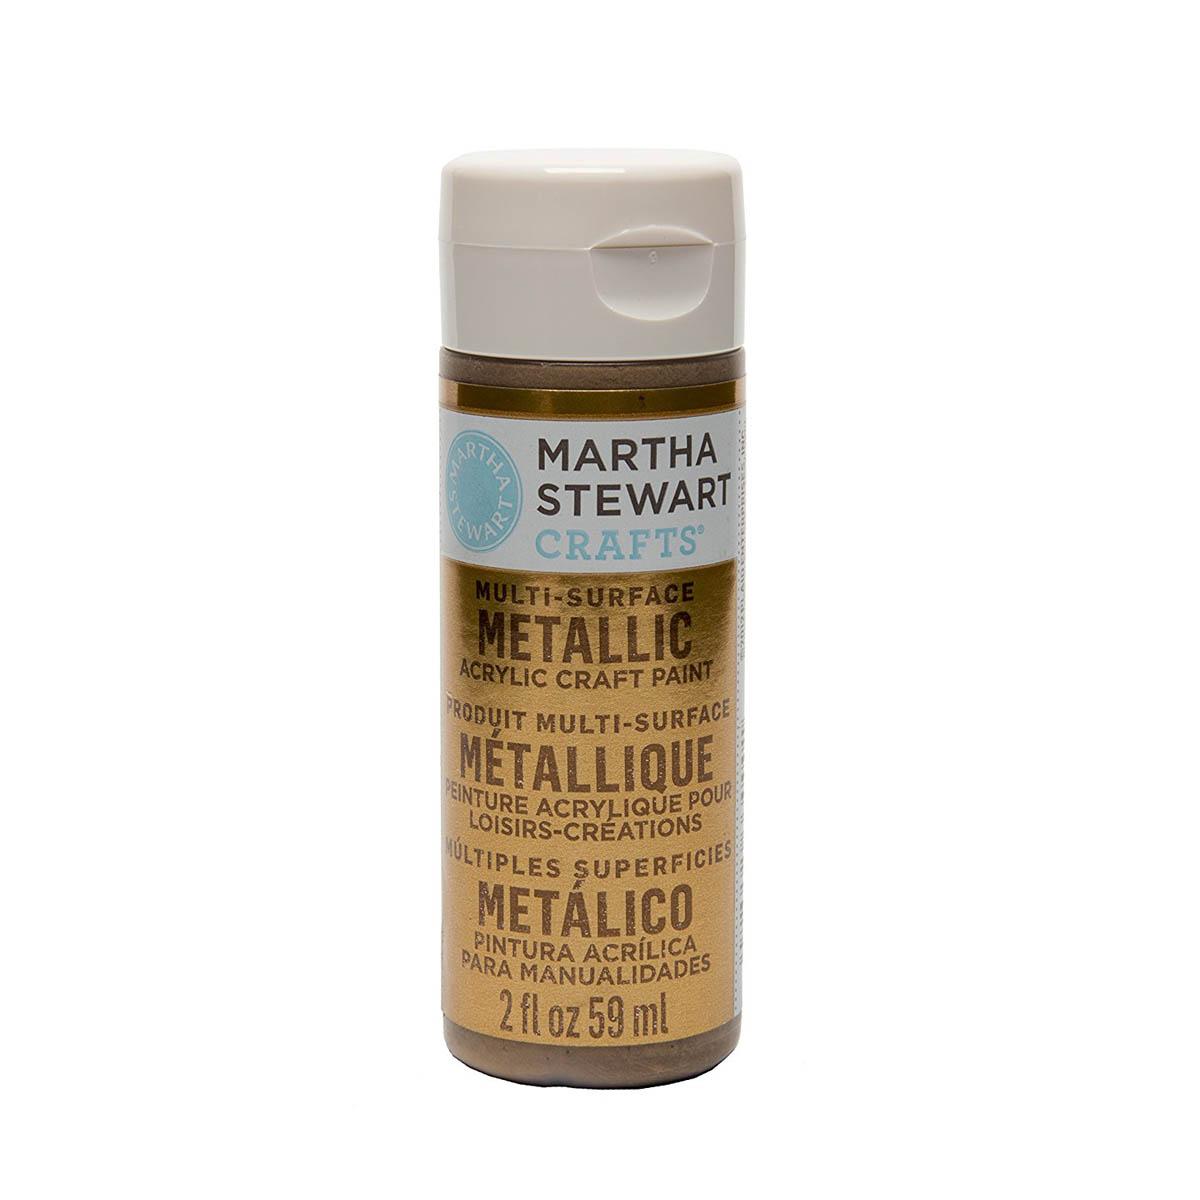 Martha Stewart ® Multi-Surface Metallic Acrylic Craft Paint - Brushed Bronze, 2 oz.